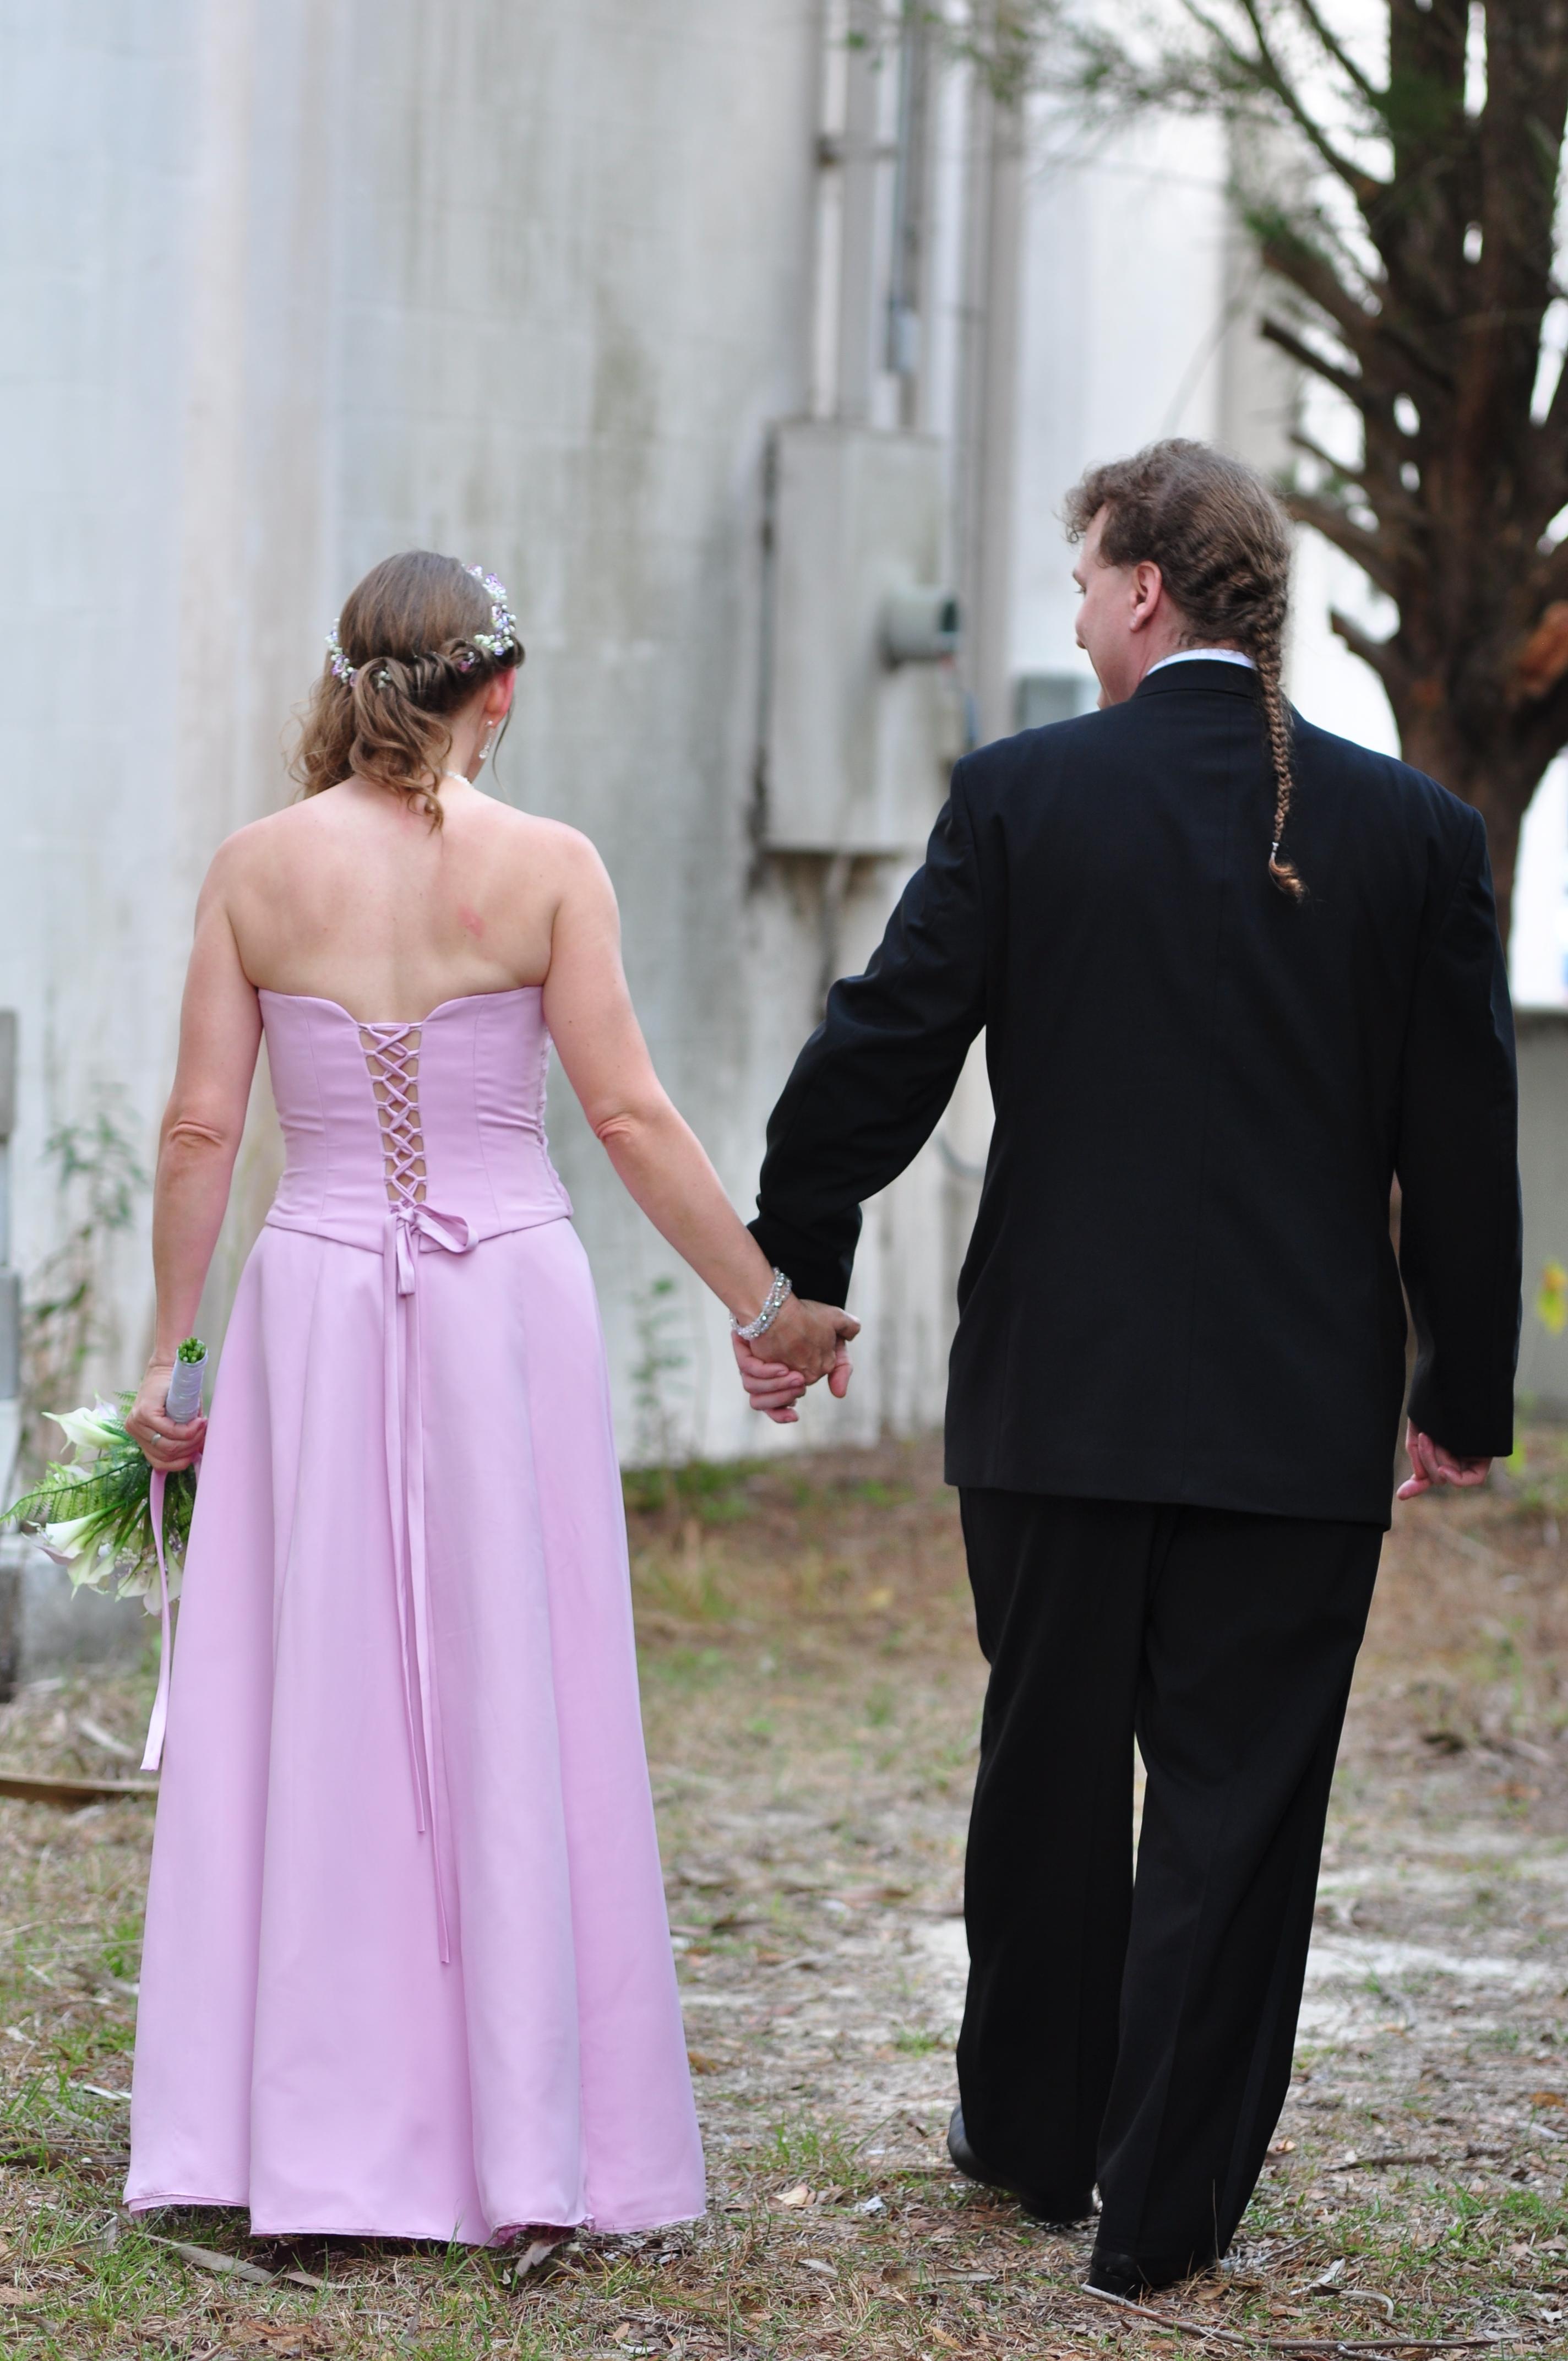 emily-and-travis-4-1-2013-april-fools-wedding-475